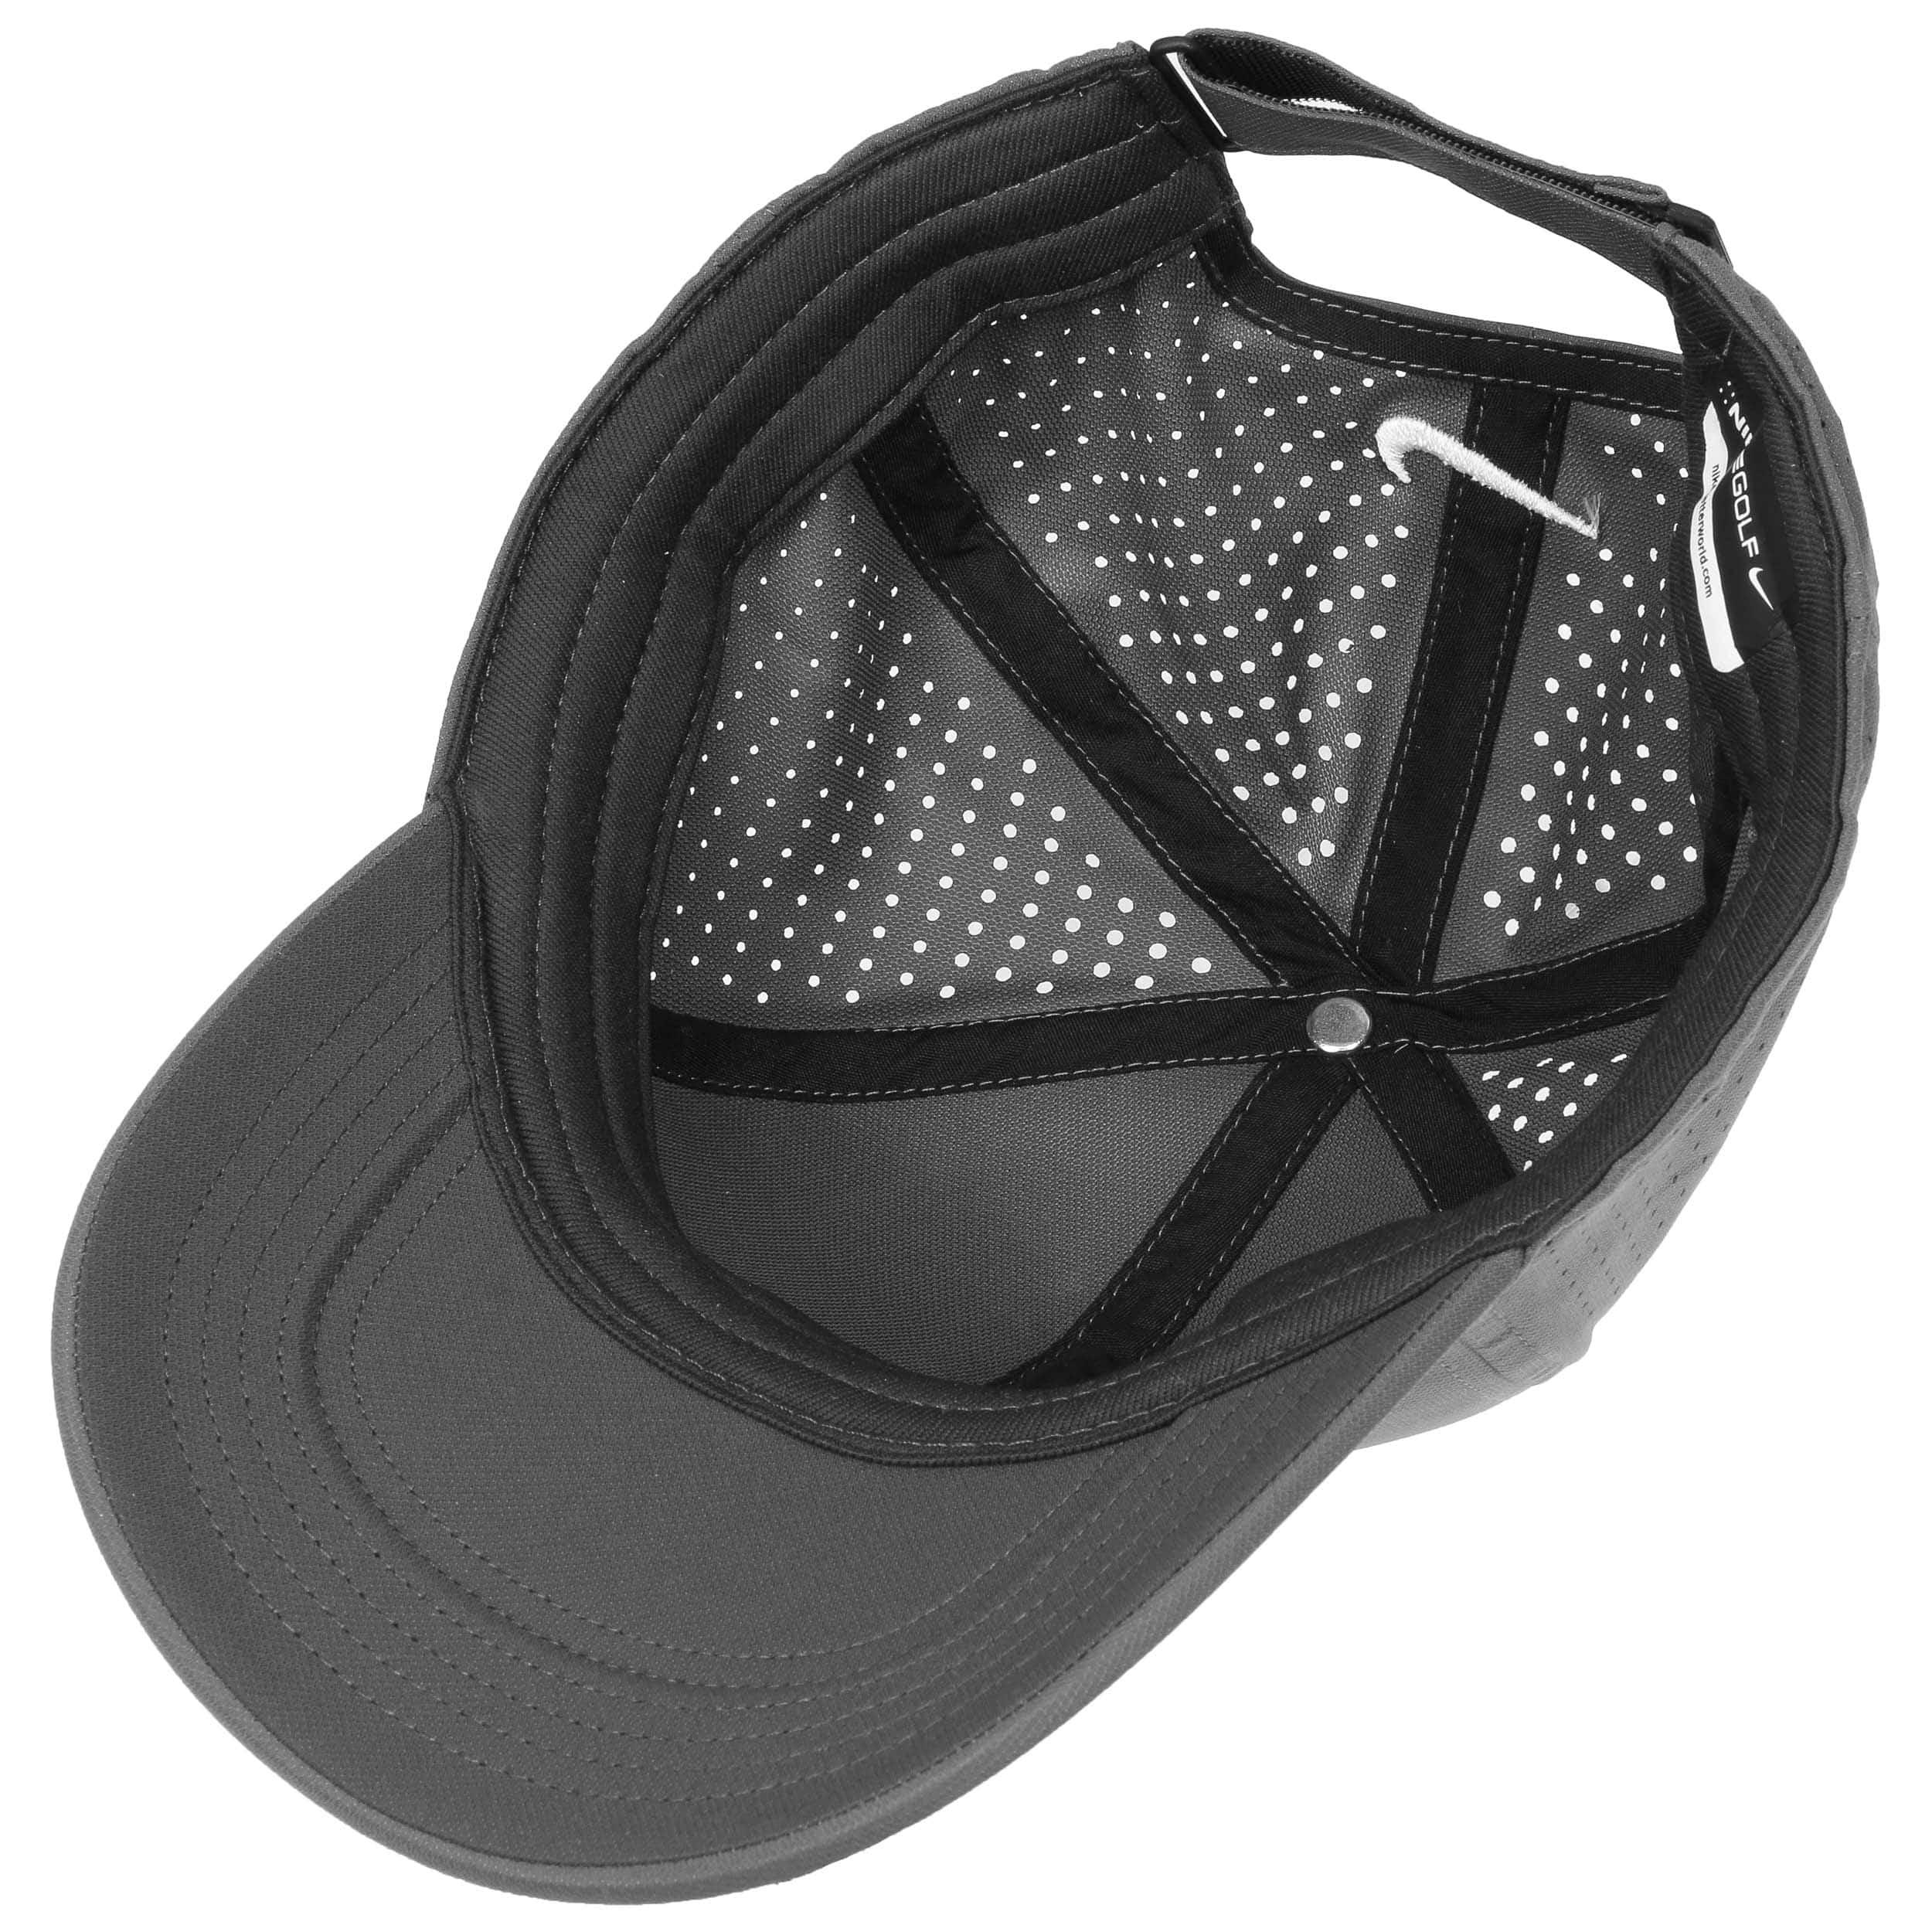 ... Cappellino Legacy 91 Perf by Nike - grigio scuro 2 ... eb35213a296f